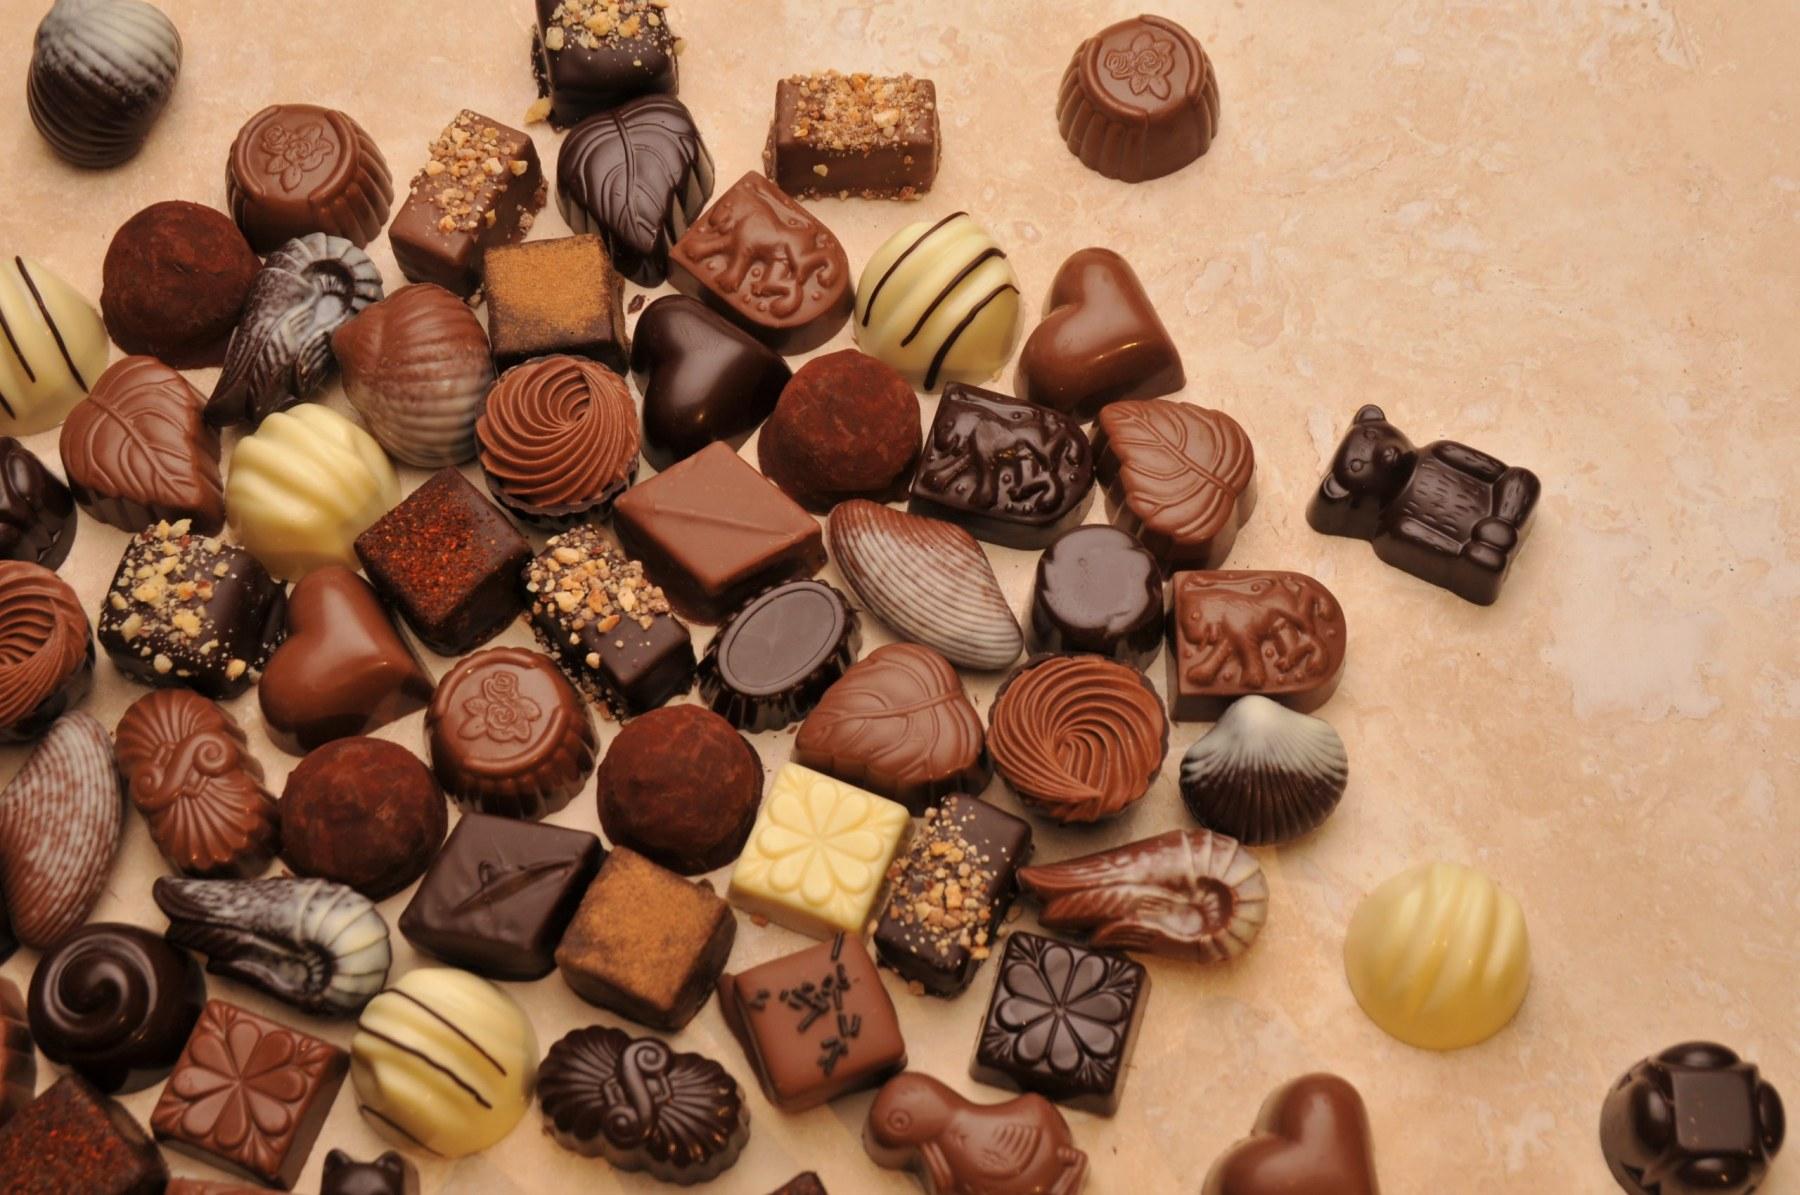 Assortment of Belgian Chocolates